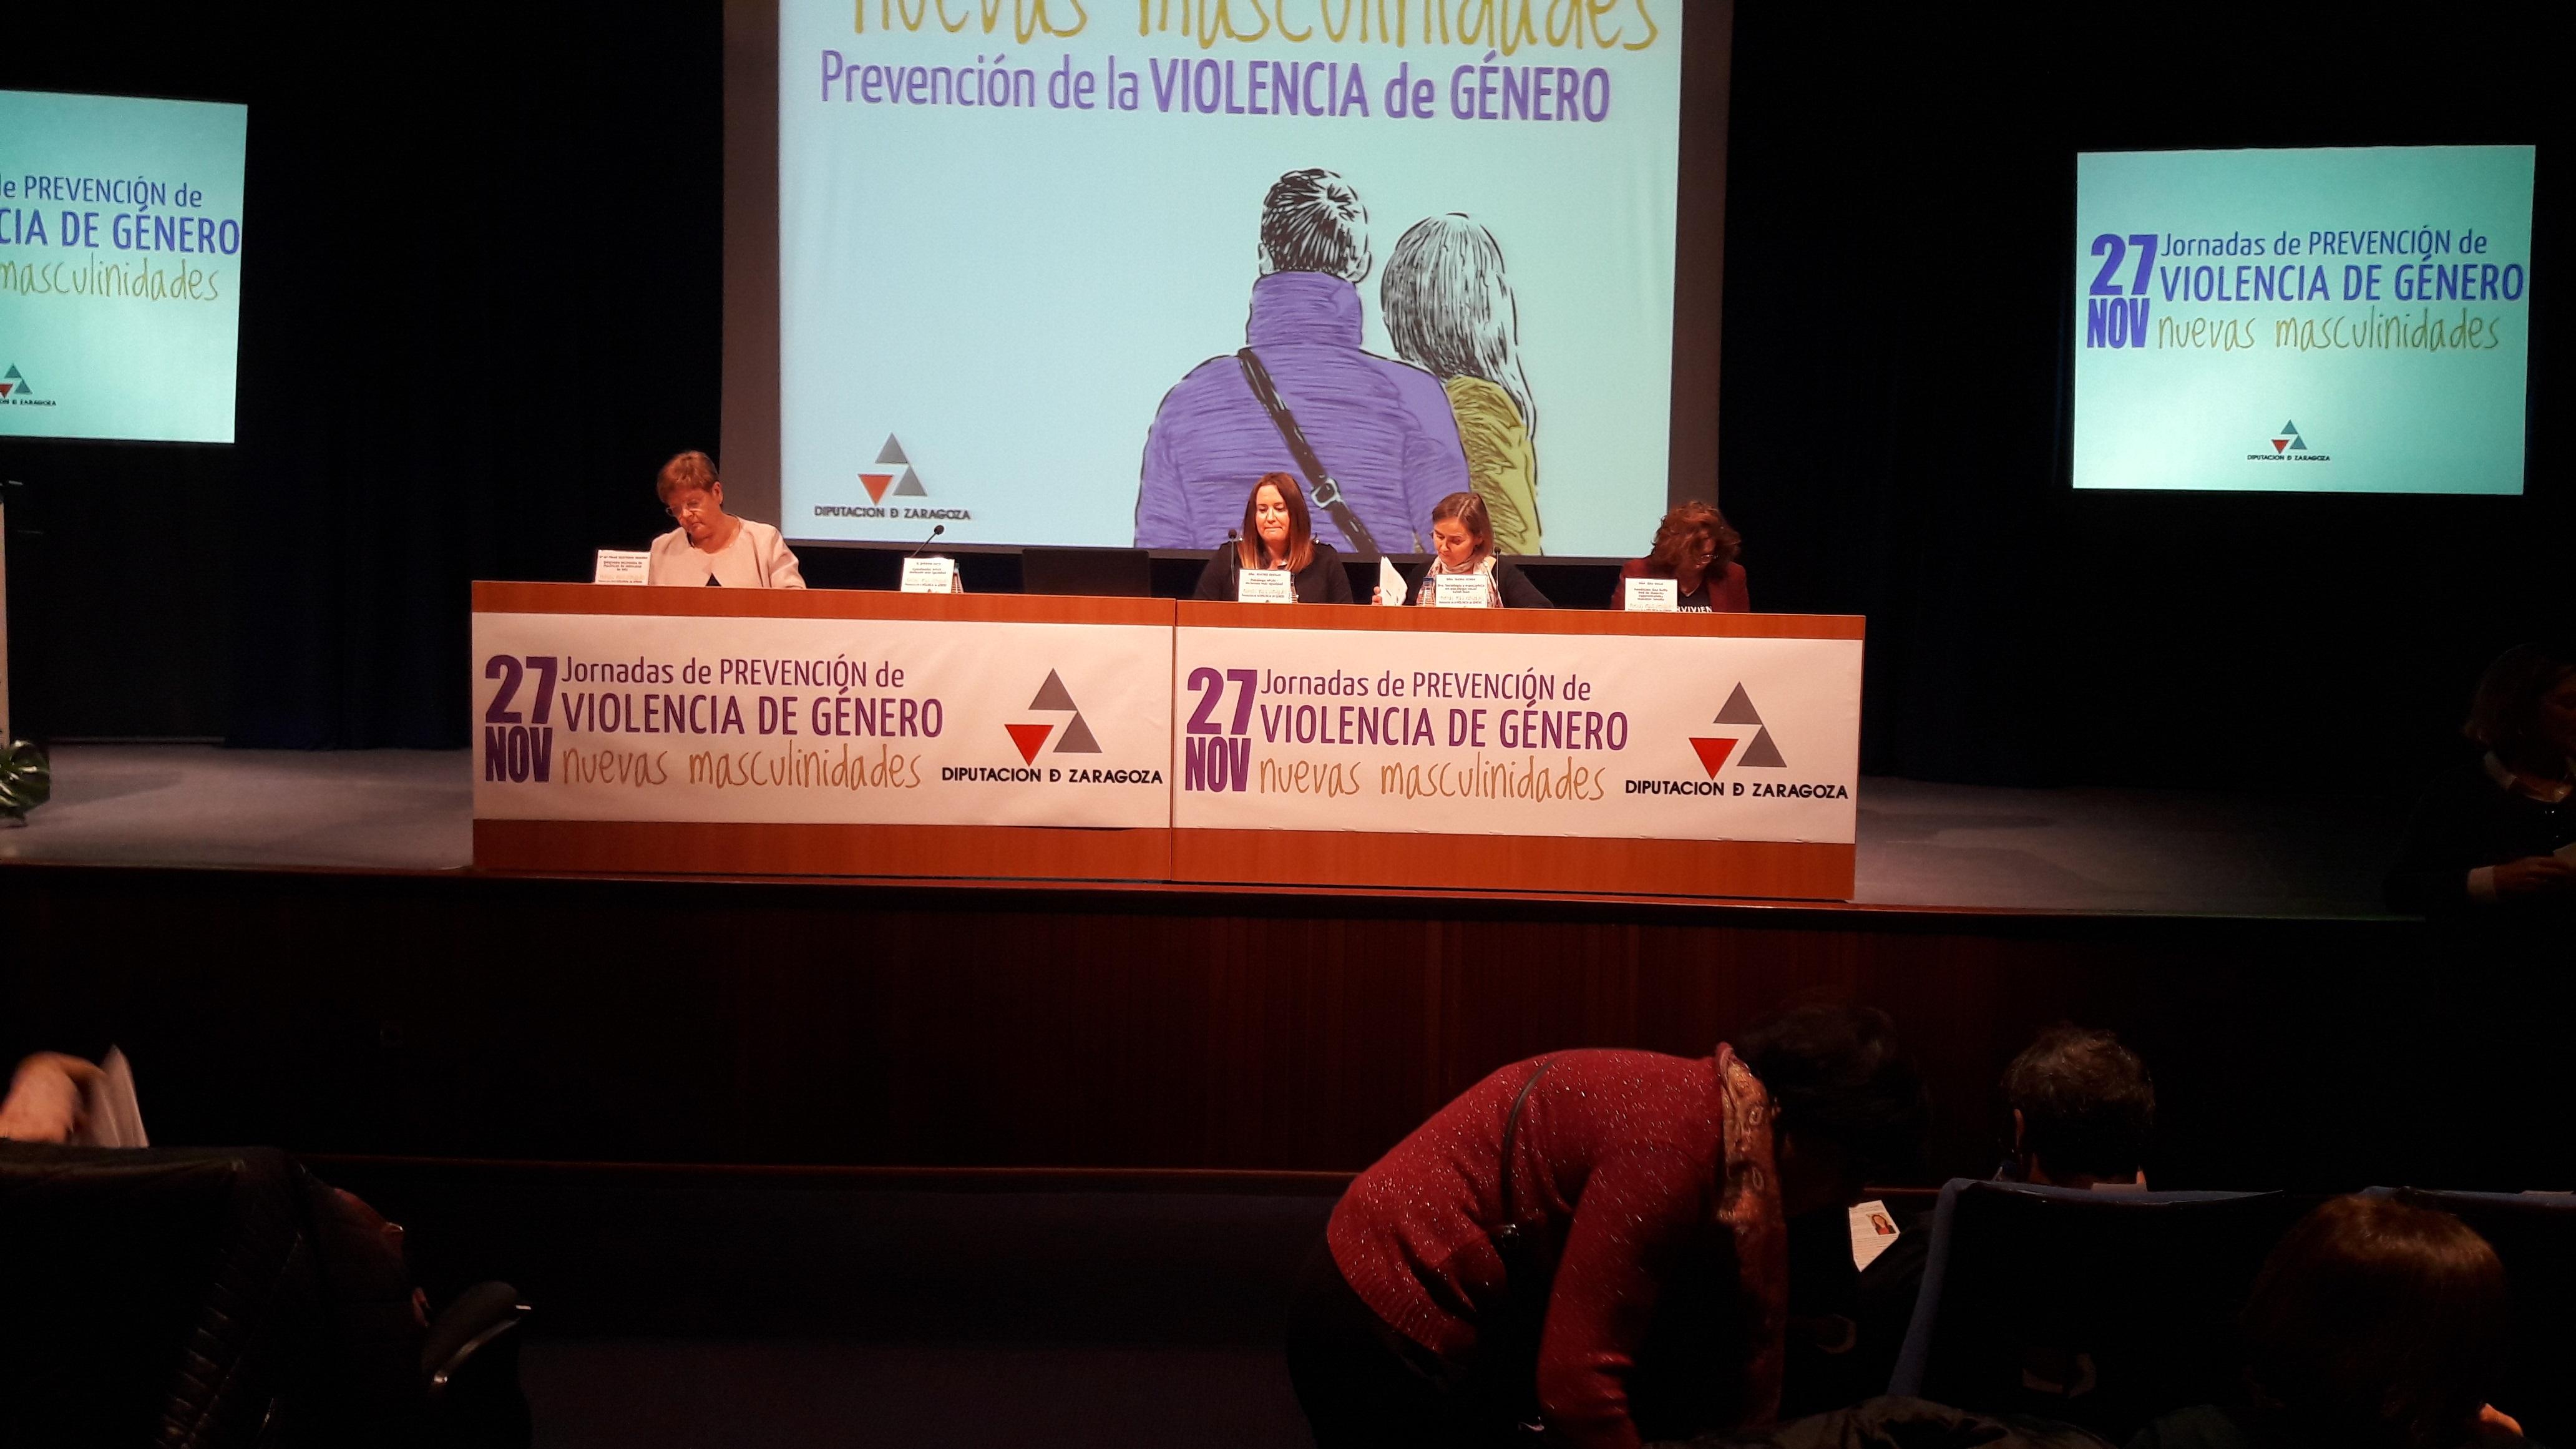 Jornadas de PREVENCIÓN de VIOLENCIA DE GÉNERO